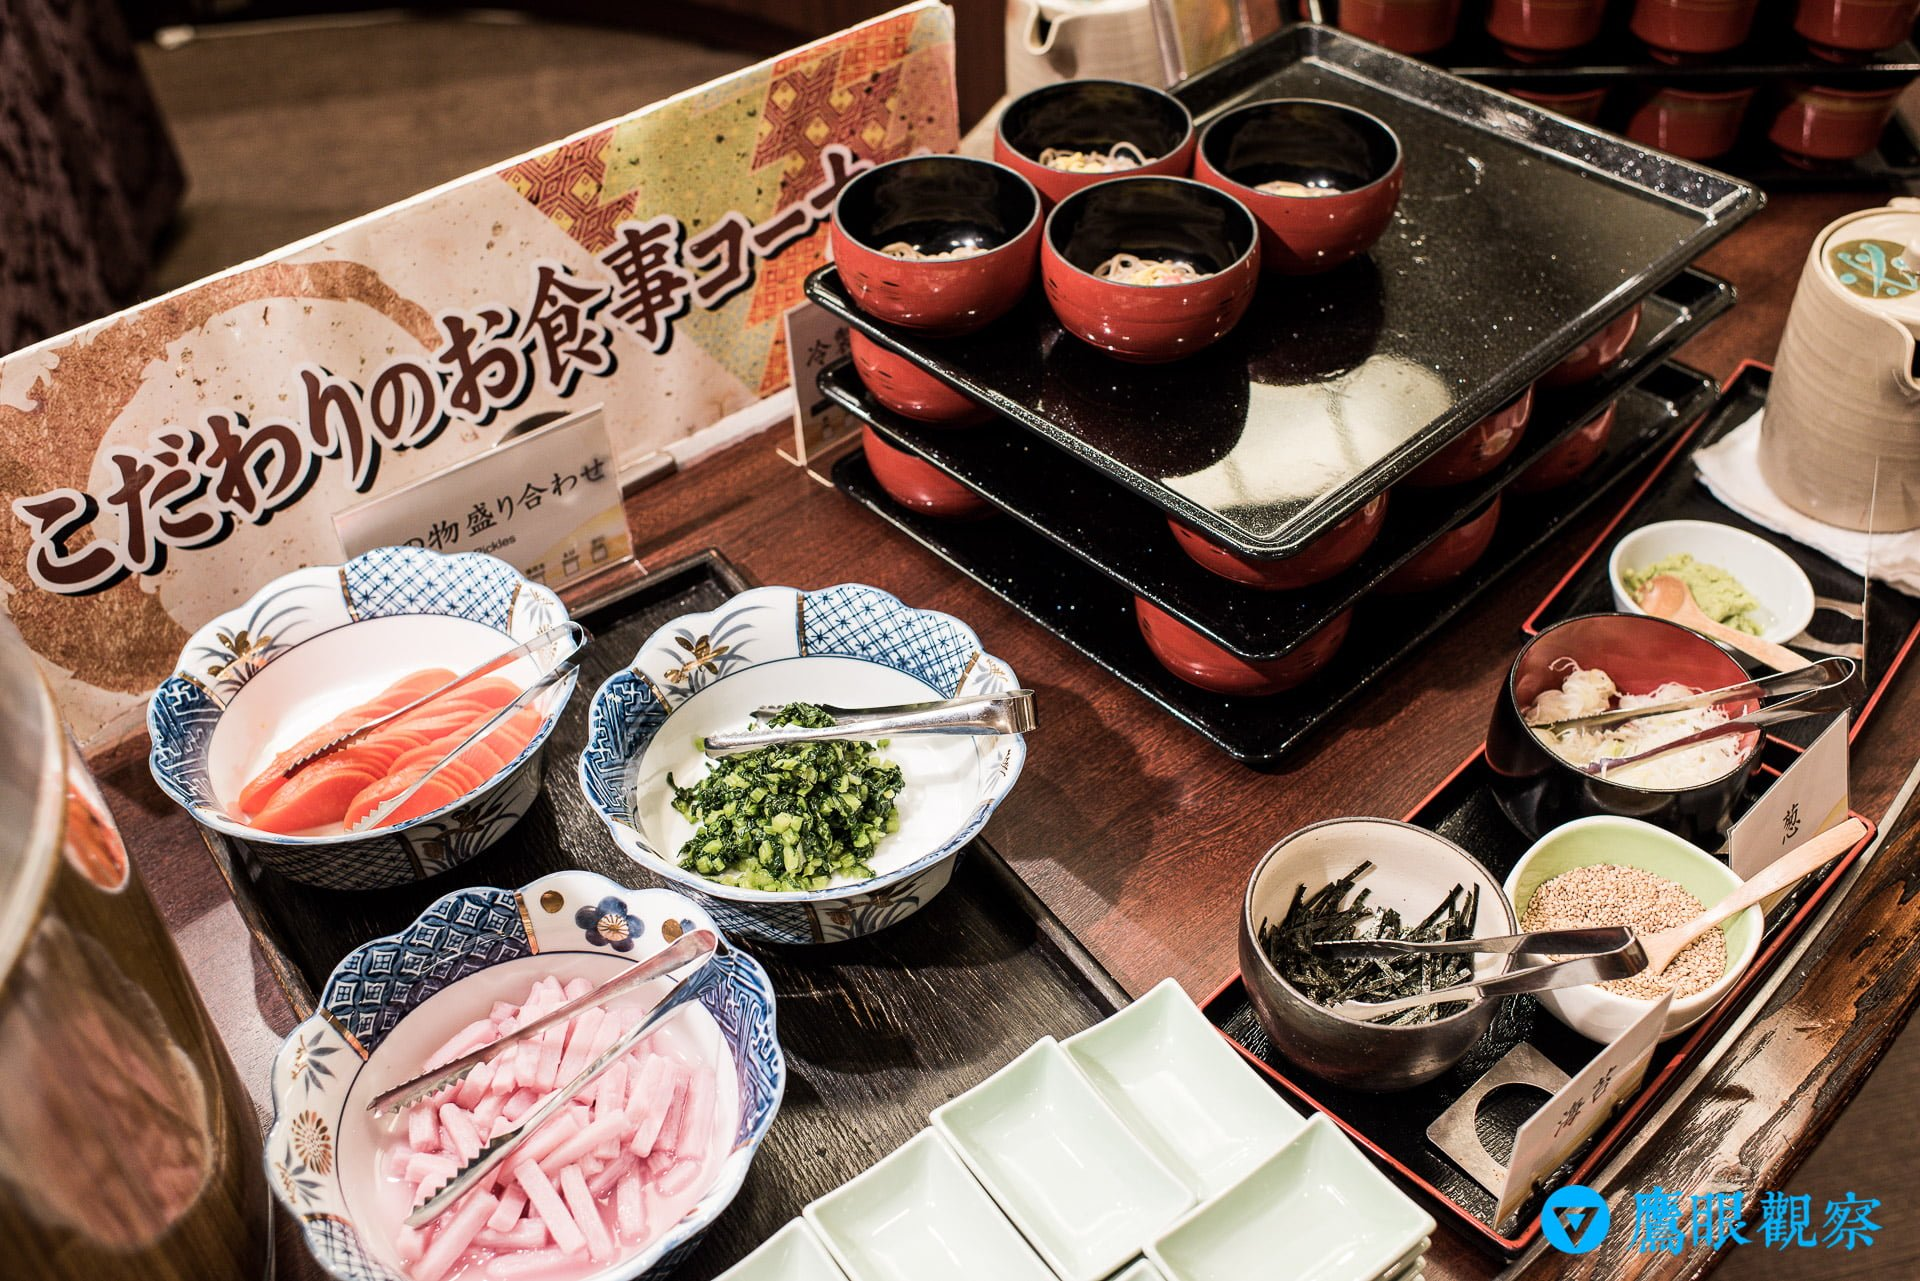 Travel Oarai Hotel in Ibaraki Prefecture Japan 34 日本茨城縣/東茨城/大洗飯店(大洗ホテル)/旅館推薦與住宿旅遊心得分享